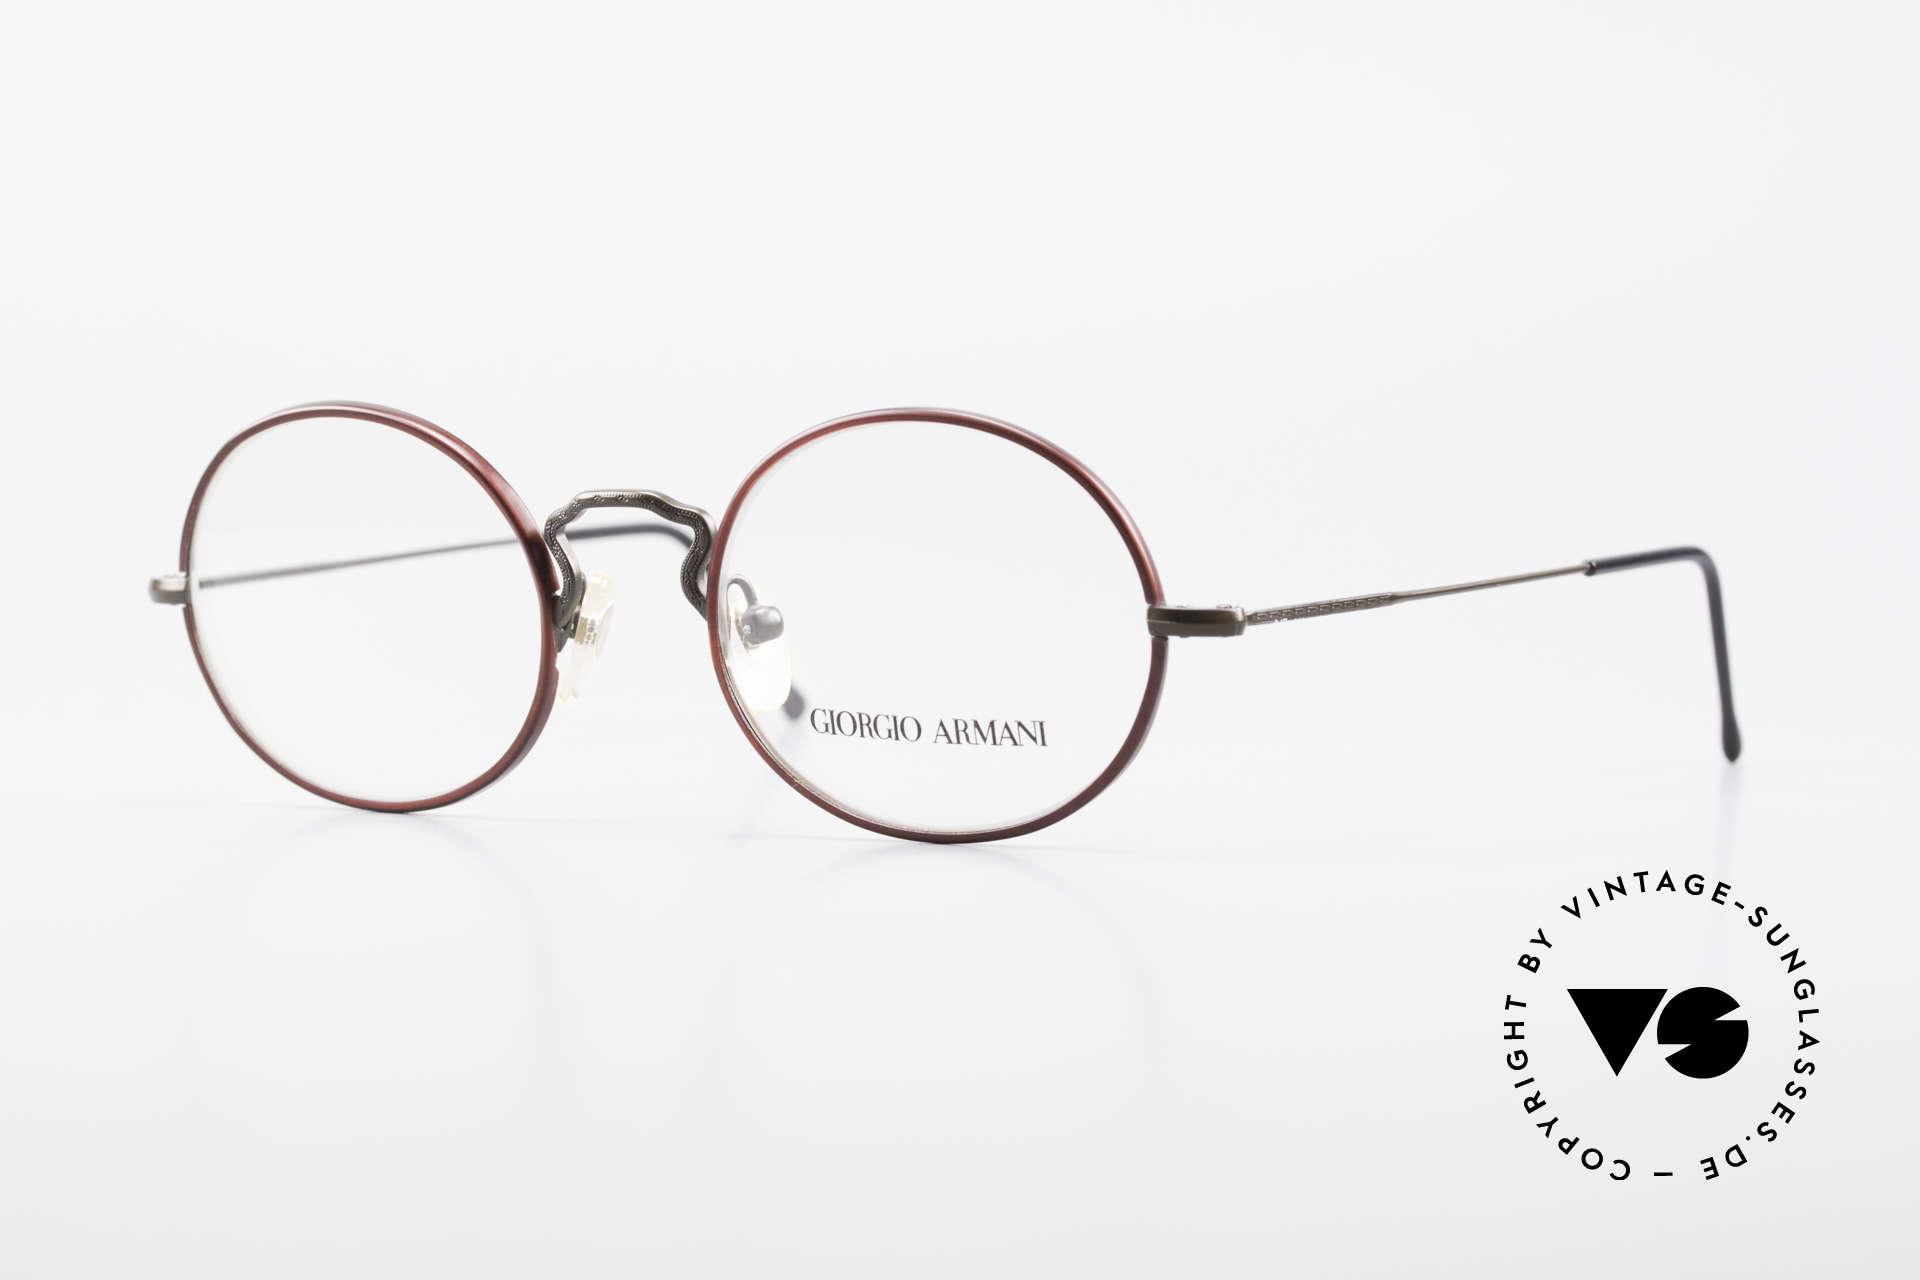 Giorgio Armani 247 Oval 90's Eyeglasses No Retro, vintage designer eyeglasses by Giorgio Armani, Italy, Made for Men and Women